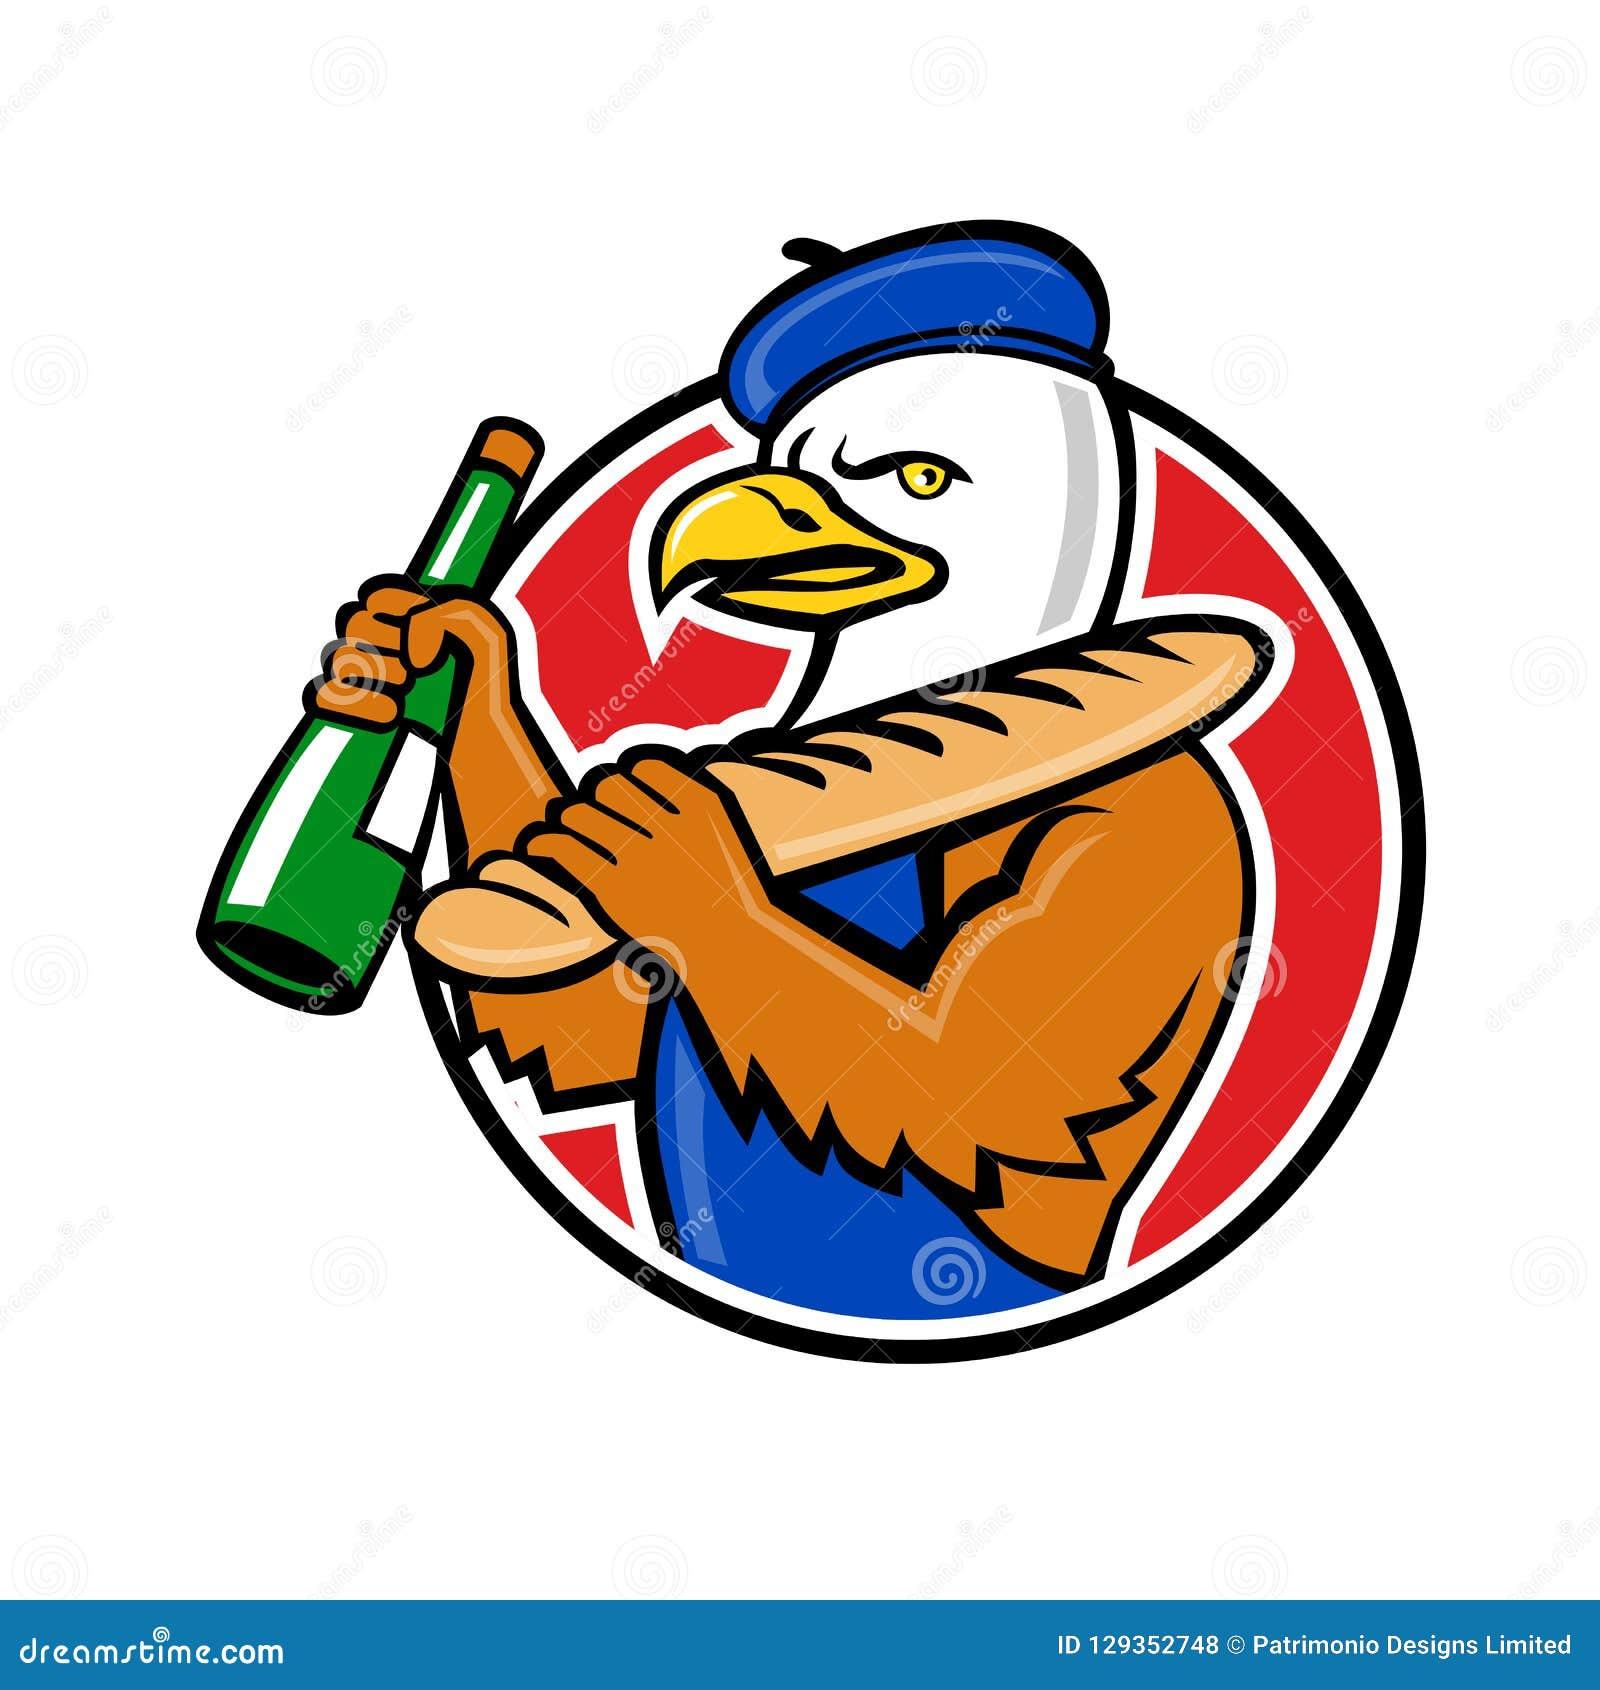 Bald Eagle Baguette Wine Circle Mascot Stock Vector